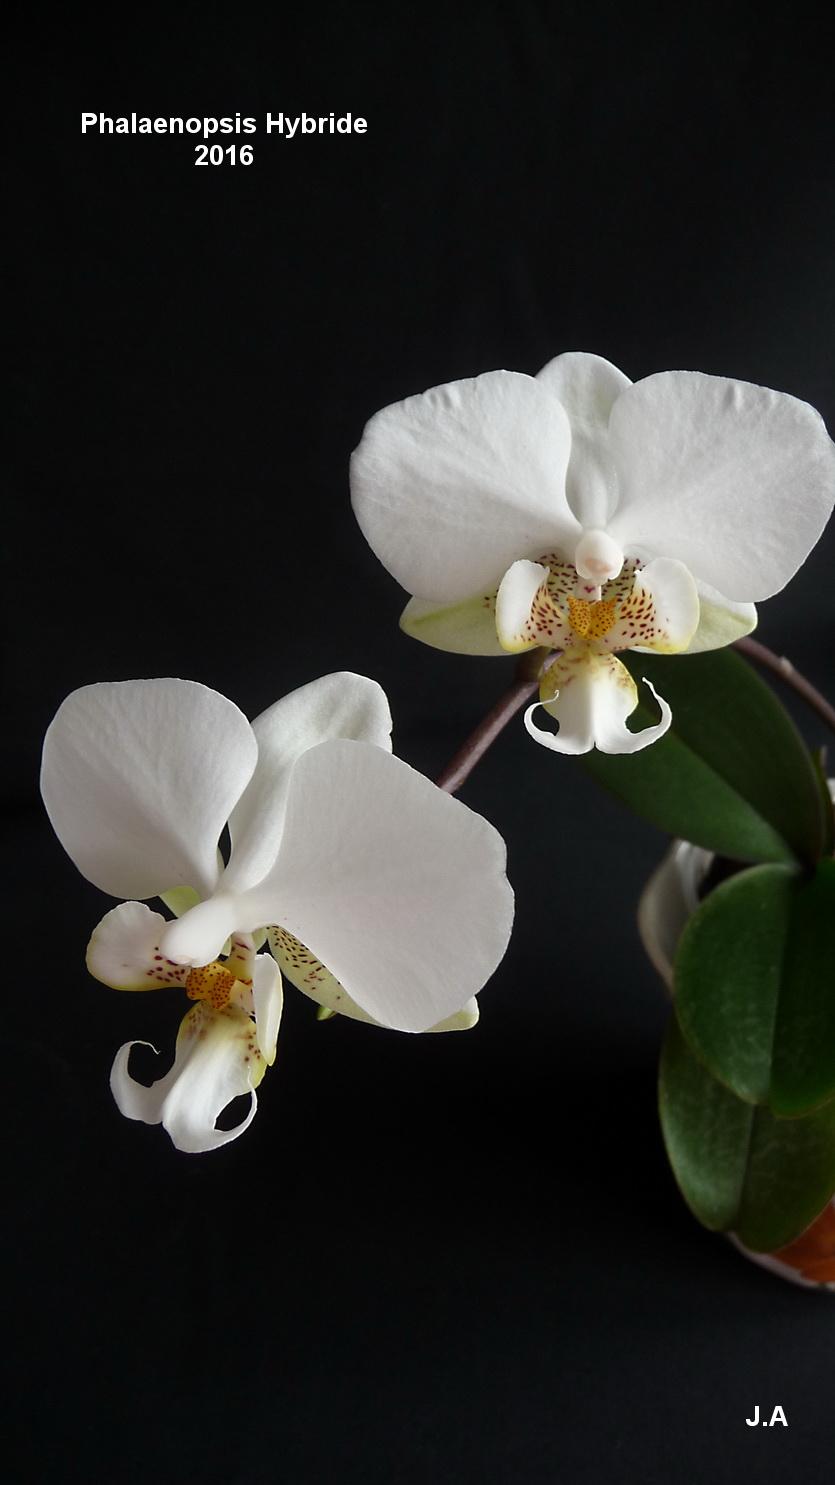 Phalaenopsis Hybride 16032602473379018